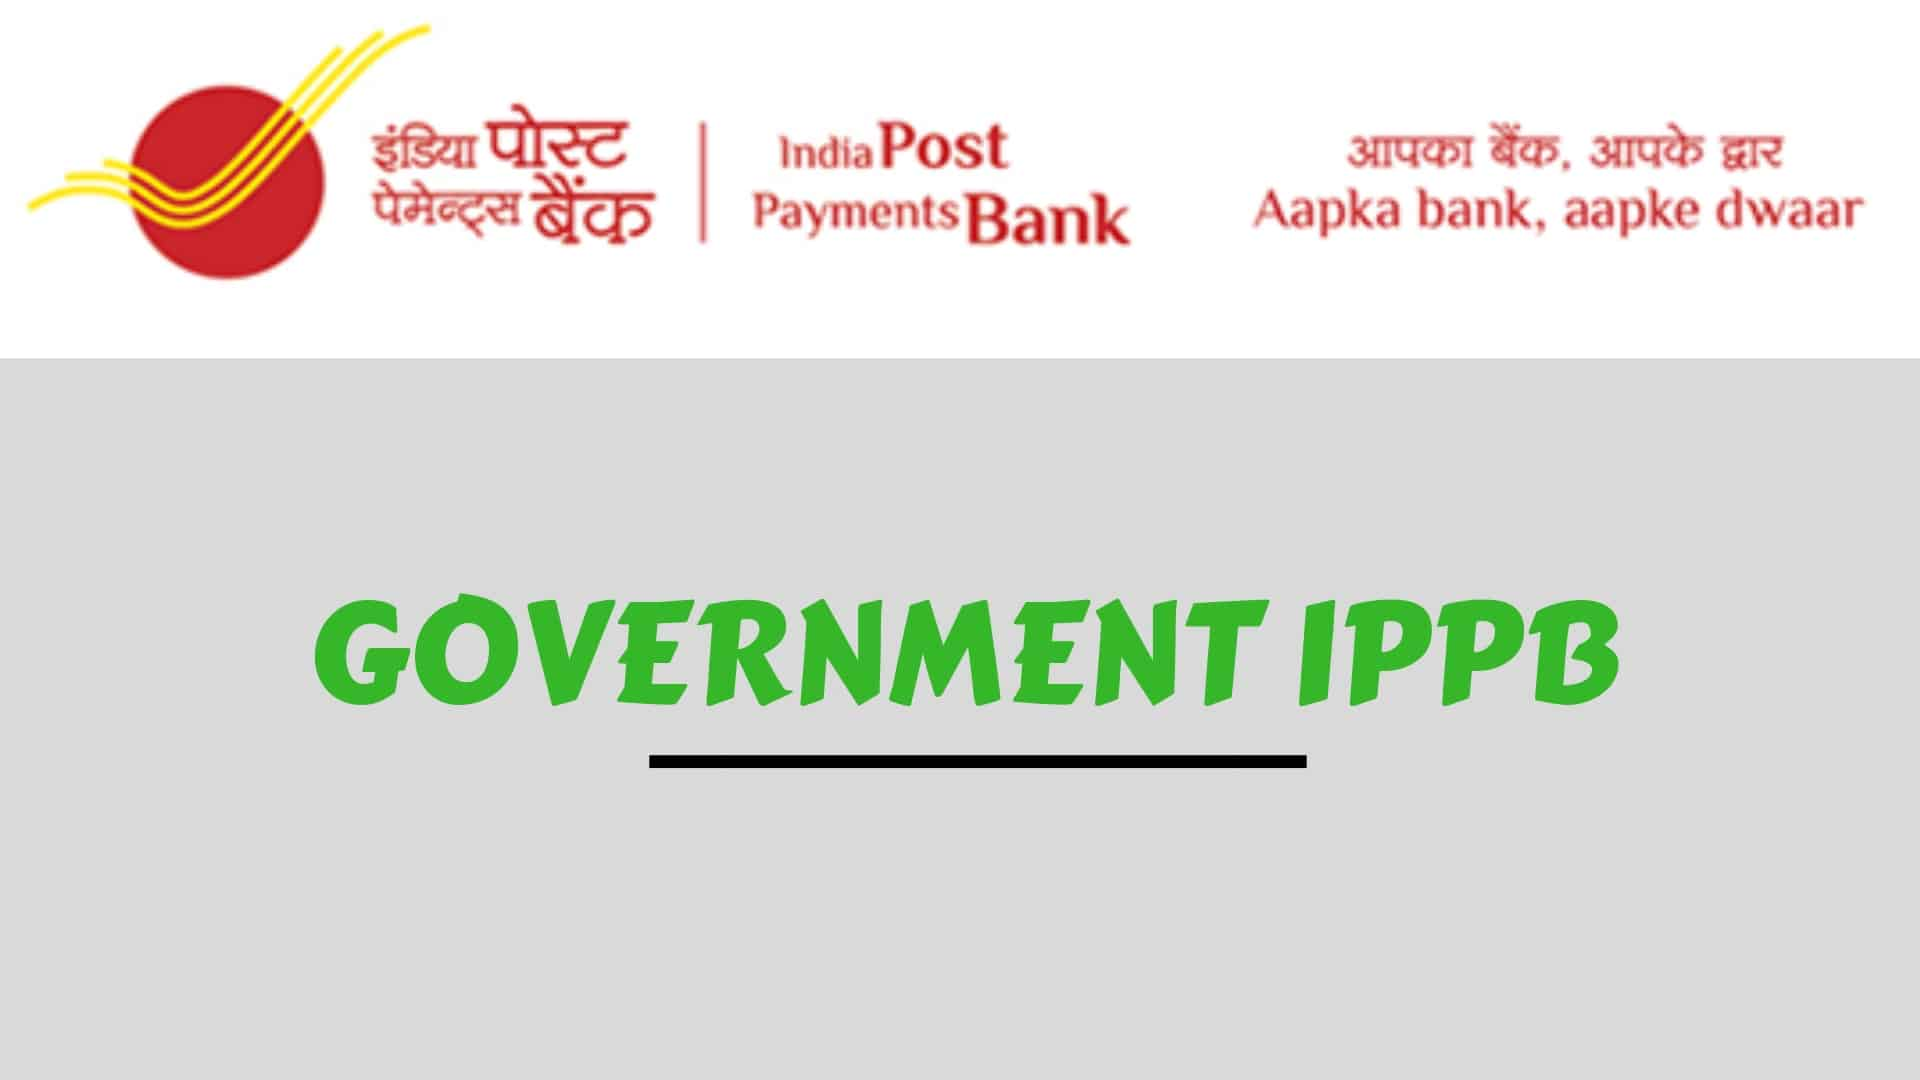 GOVERNMENT IPPB